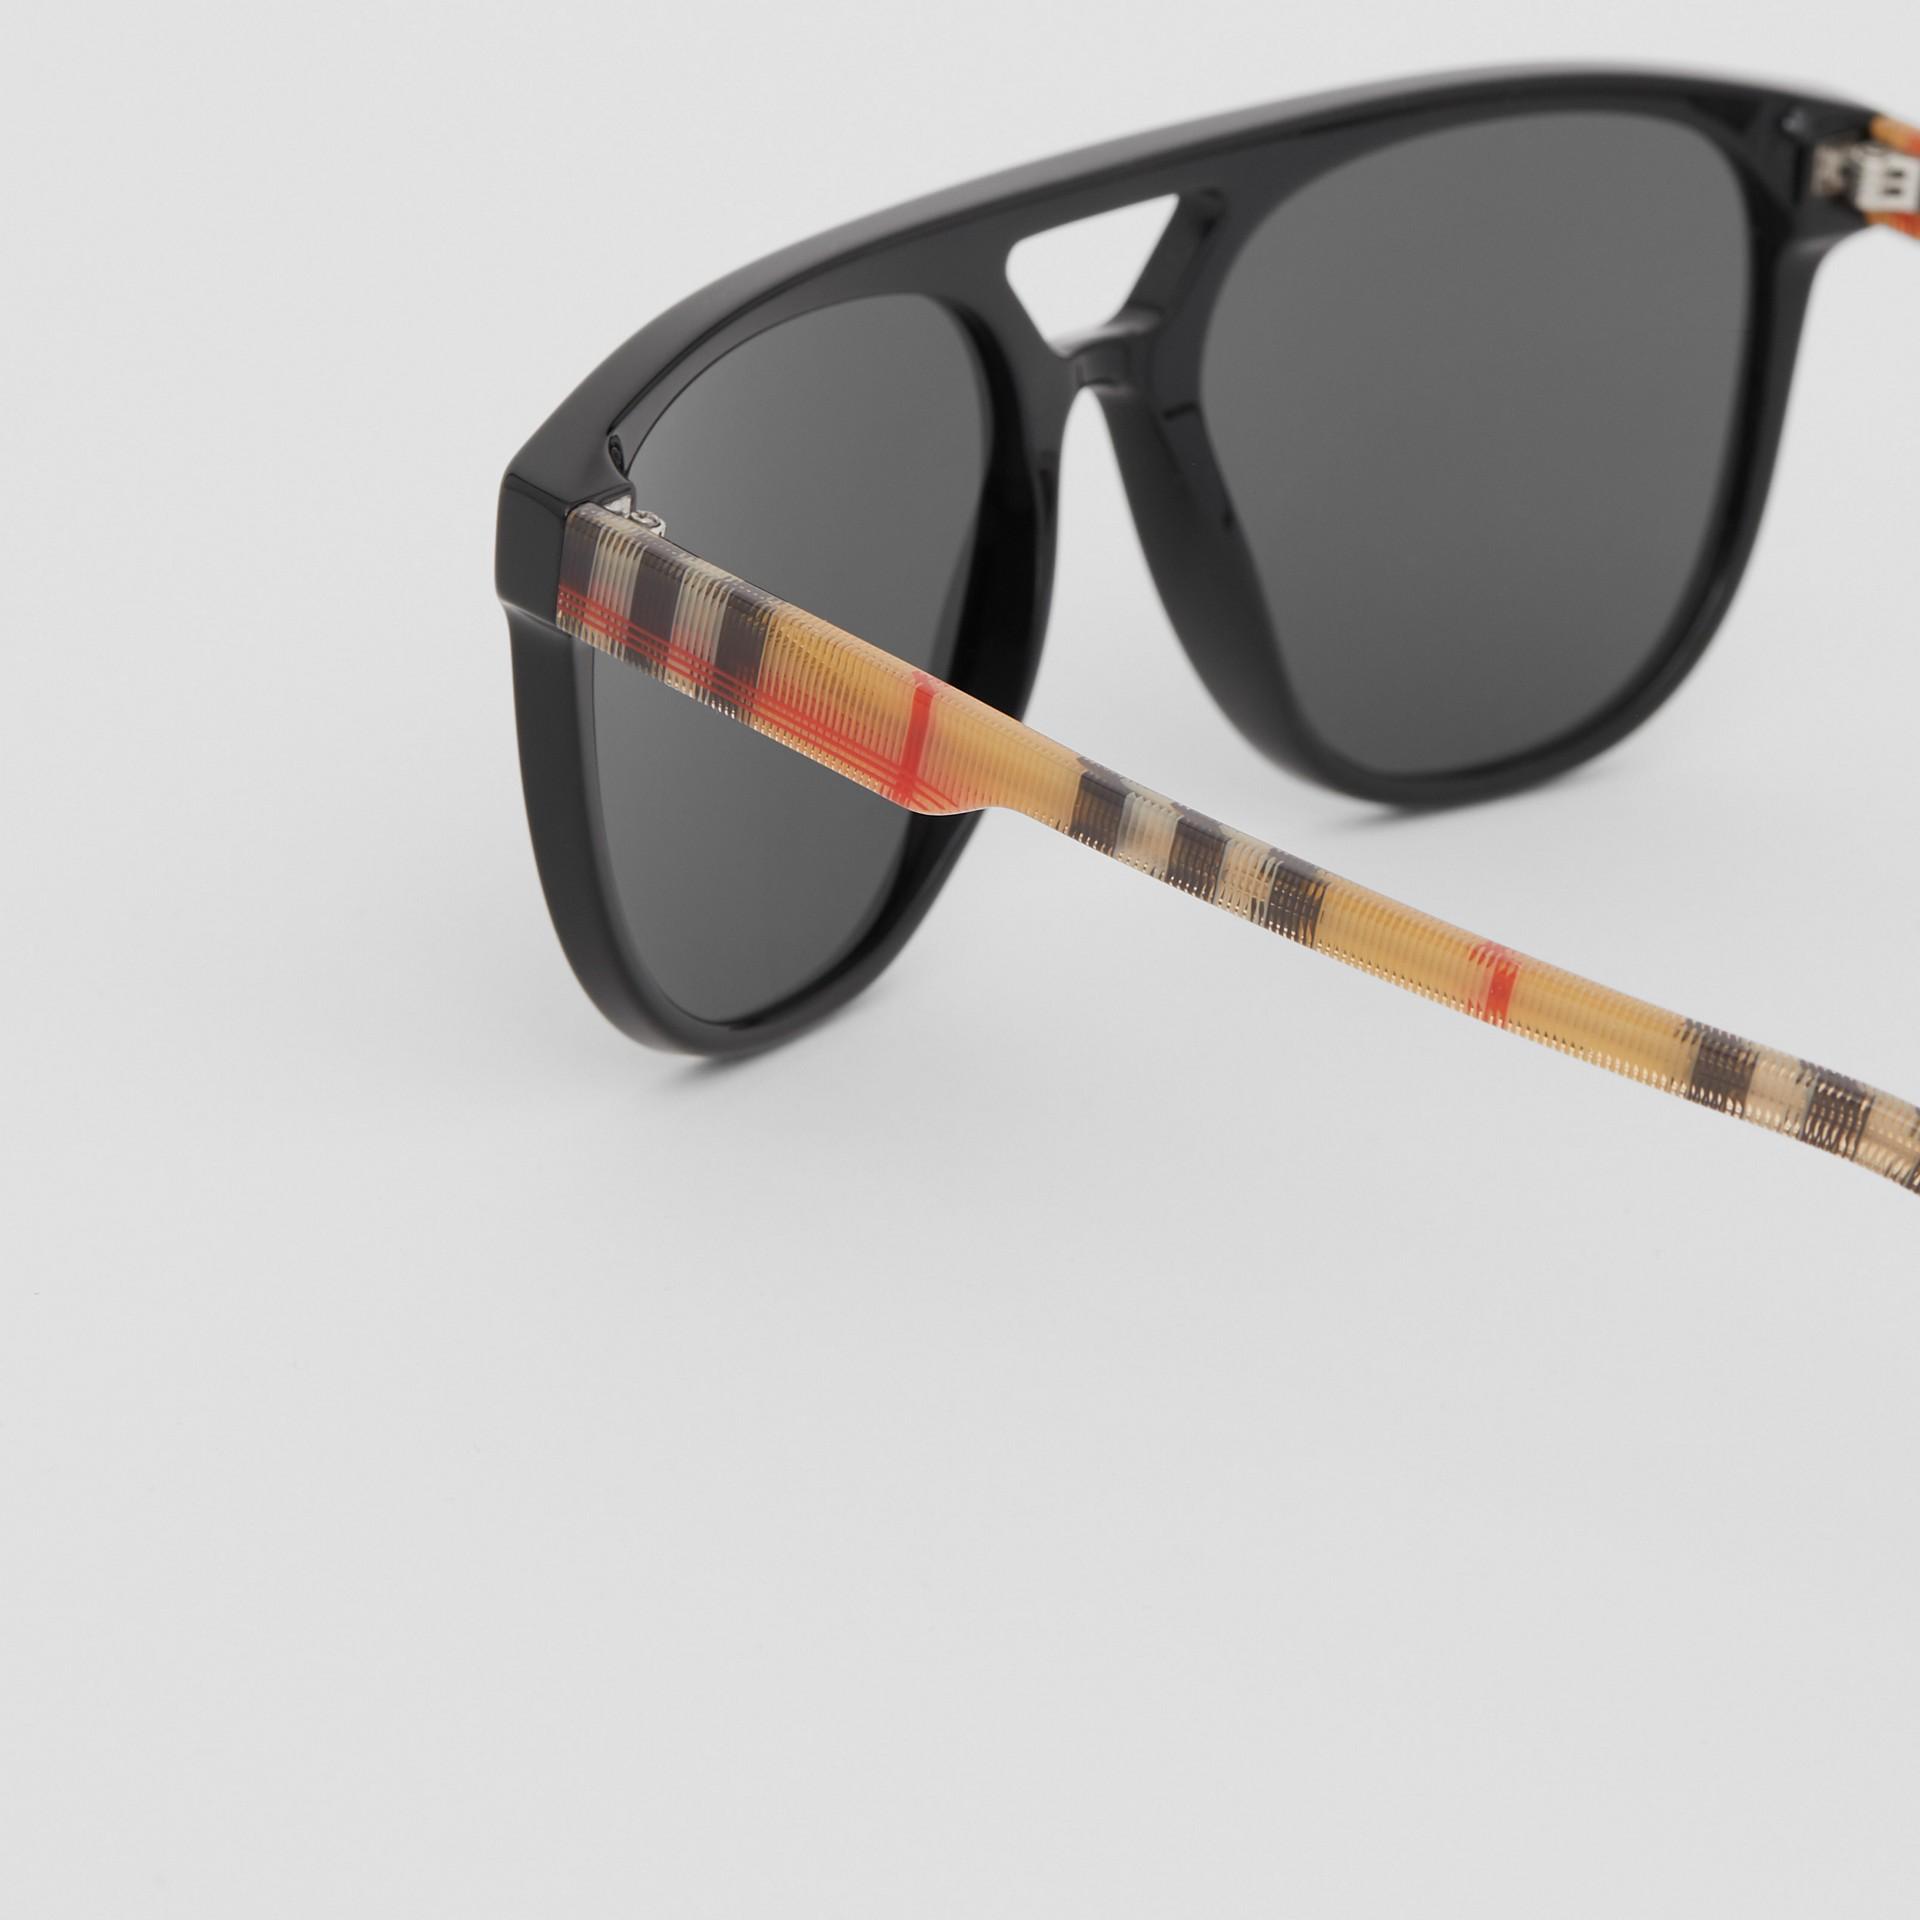 Navigator sunglasses in Black | Burberry - gallery image 1